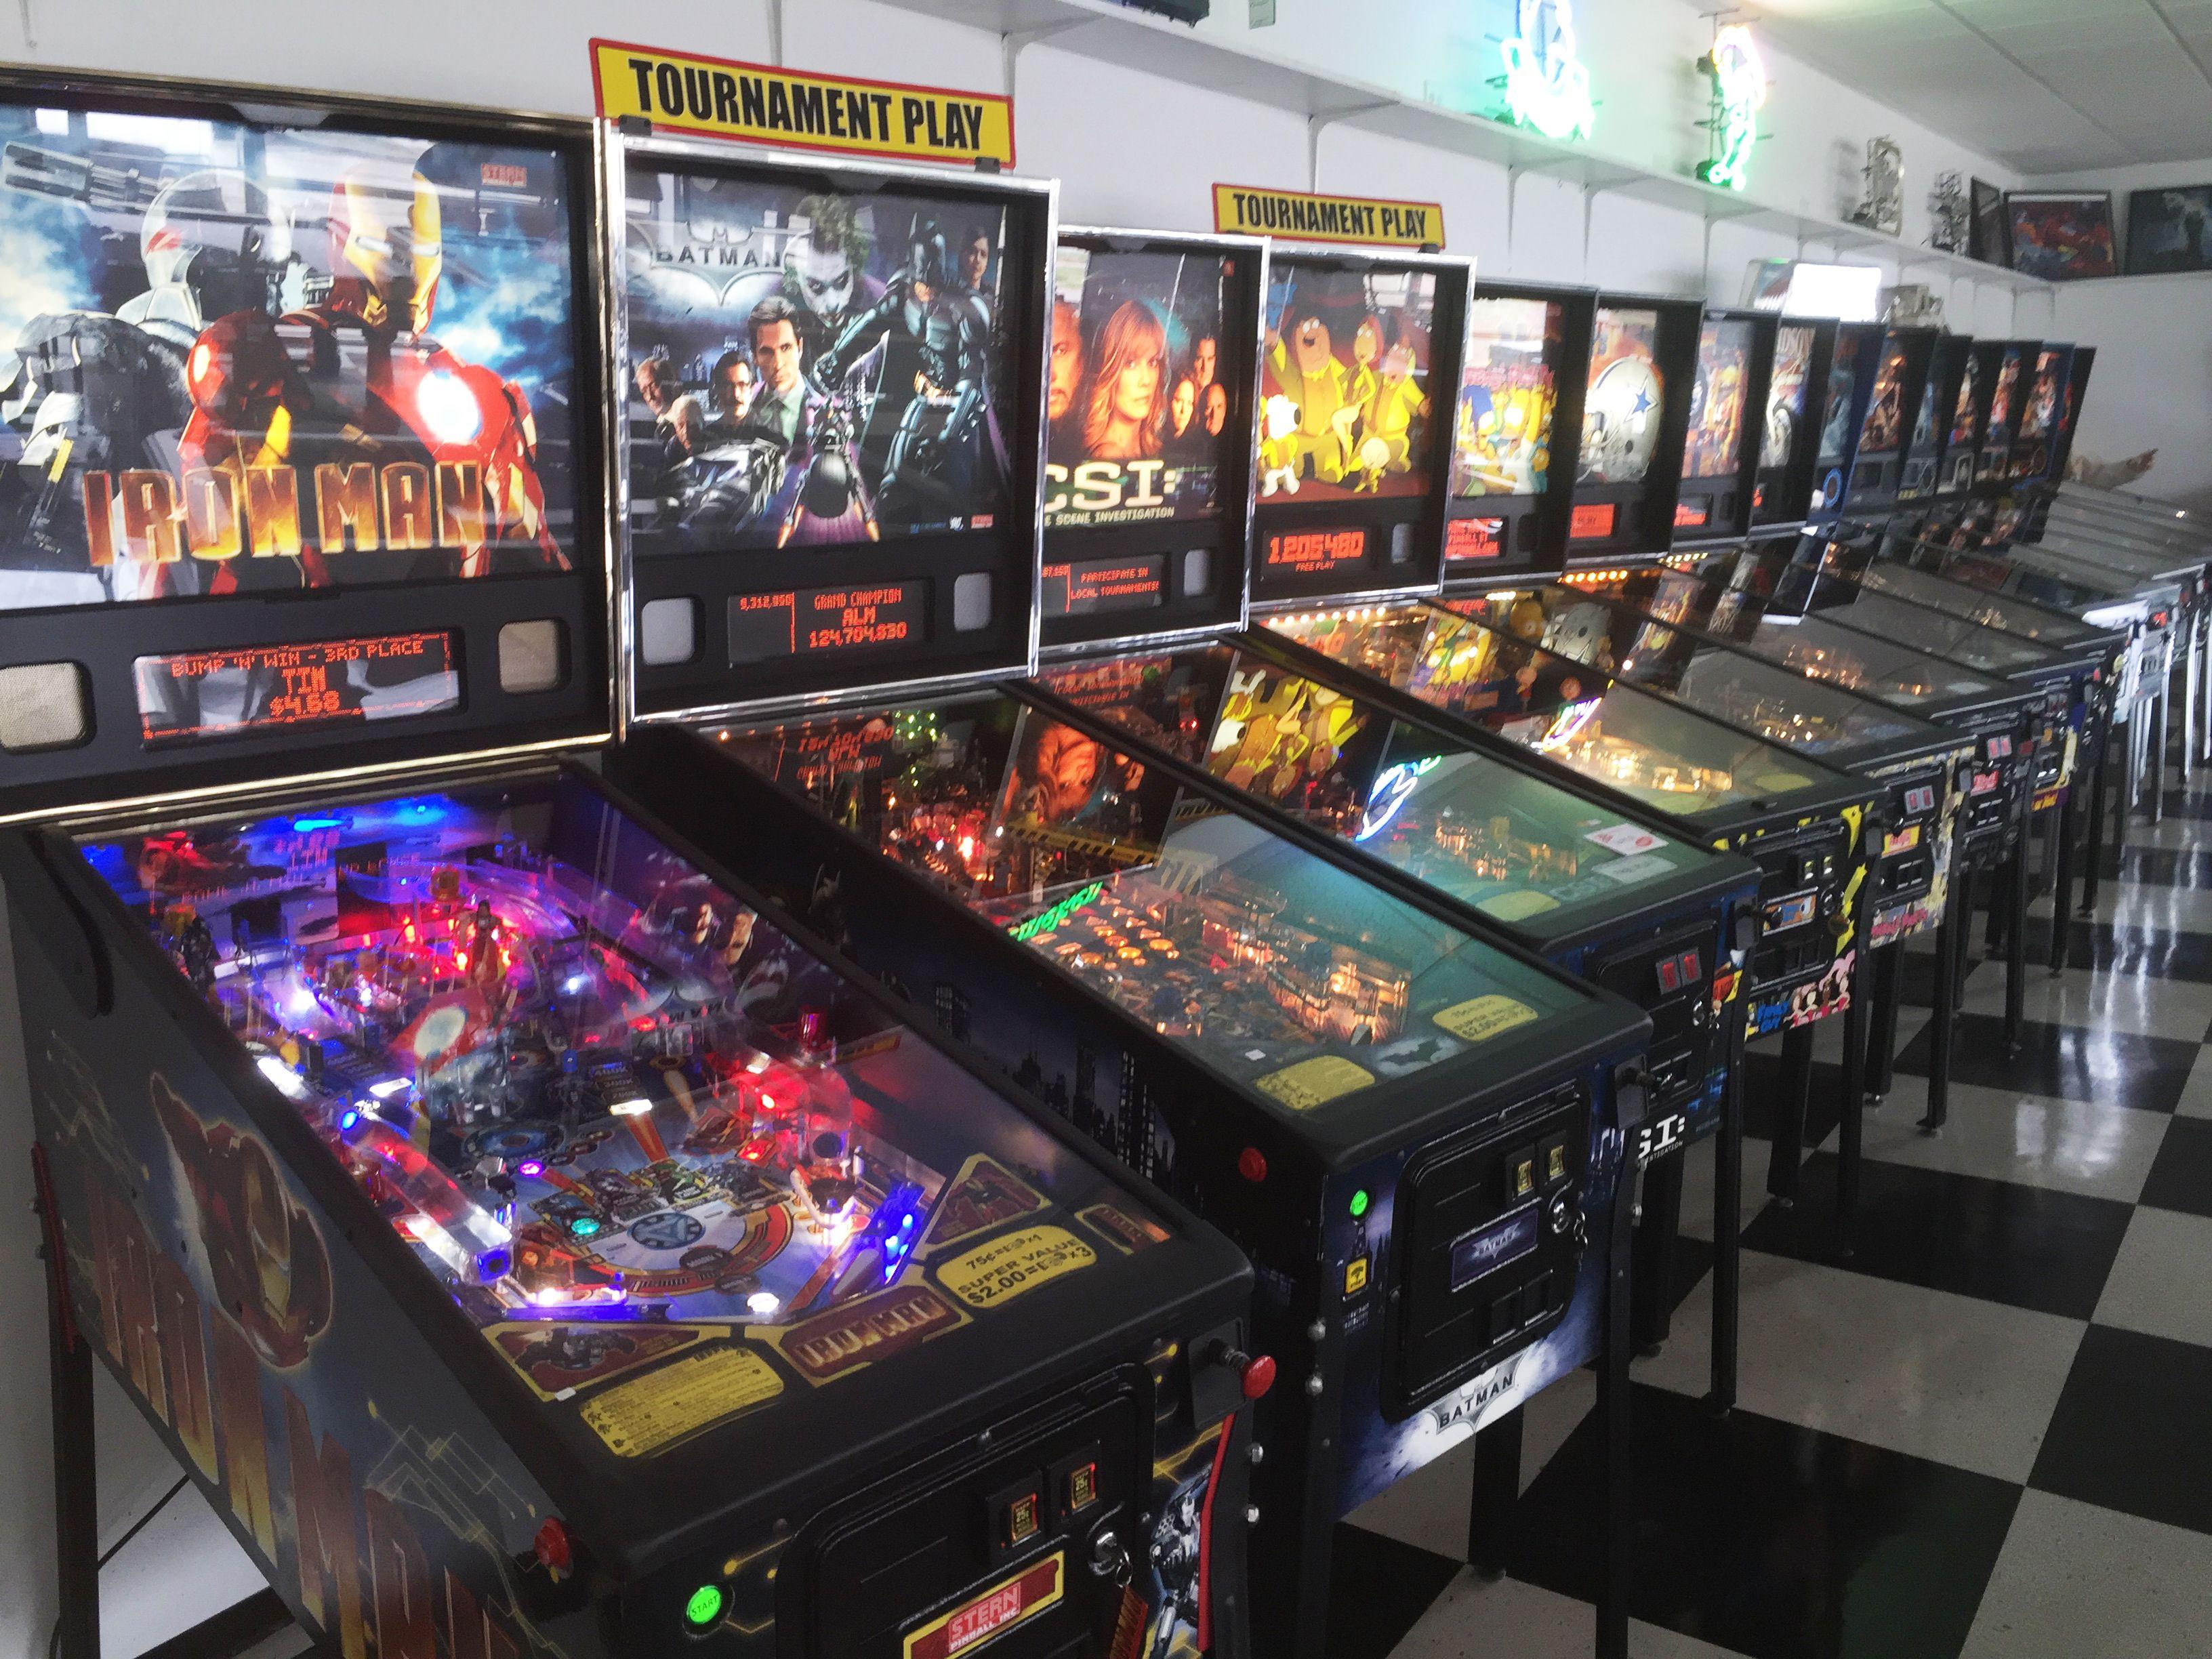 Fun Billiards u0026 Gameroom Superstore Address 4539 Gus Thomasson Rd Mesquite TX 75150 & Fun Billiards u0026 Gameroom Superstore Address: 4539 Gus Thomasson Rd ...